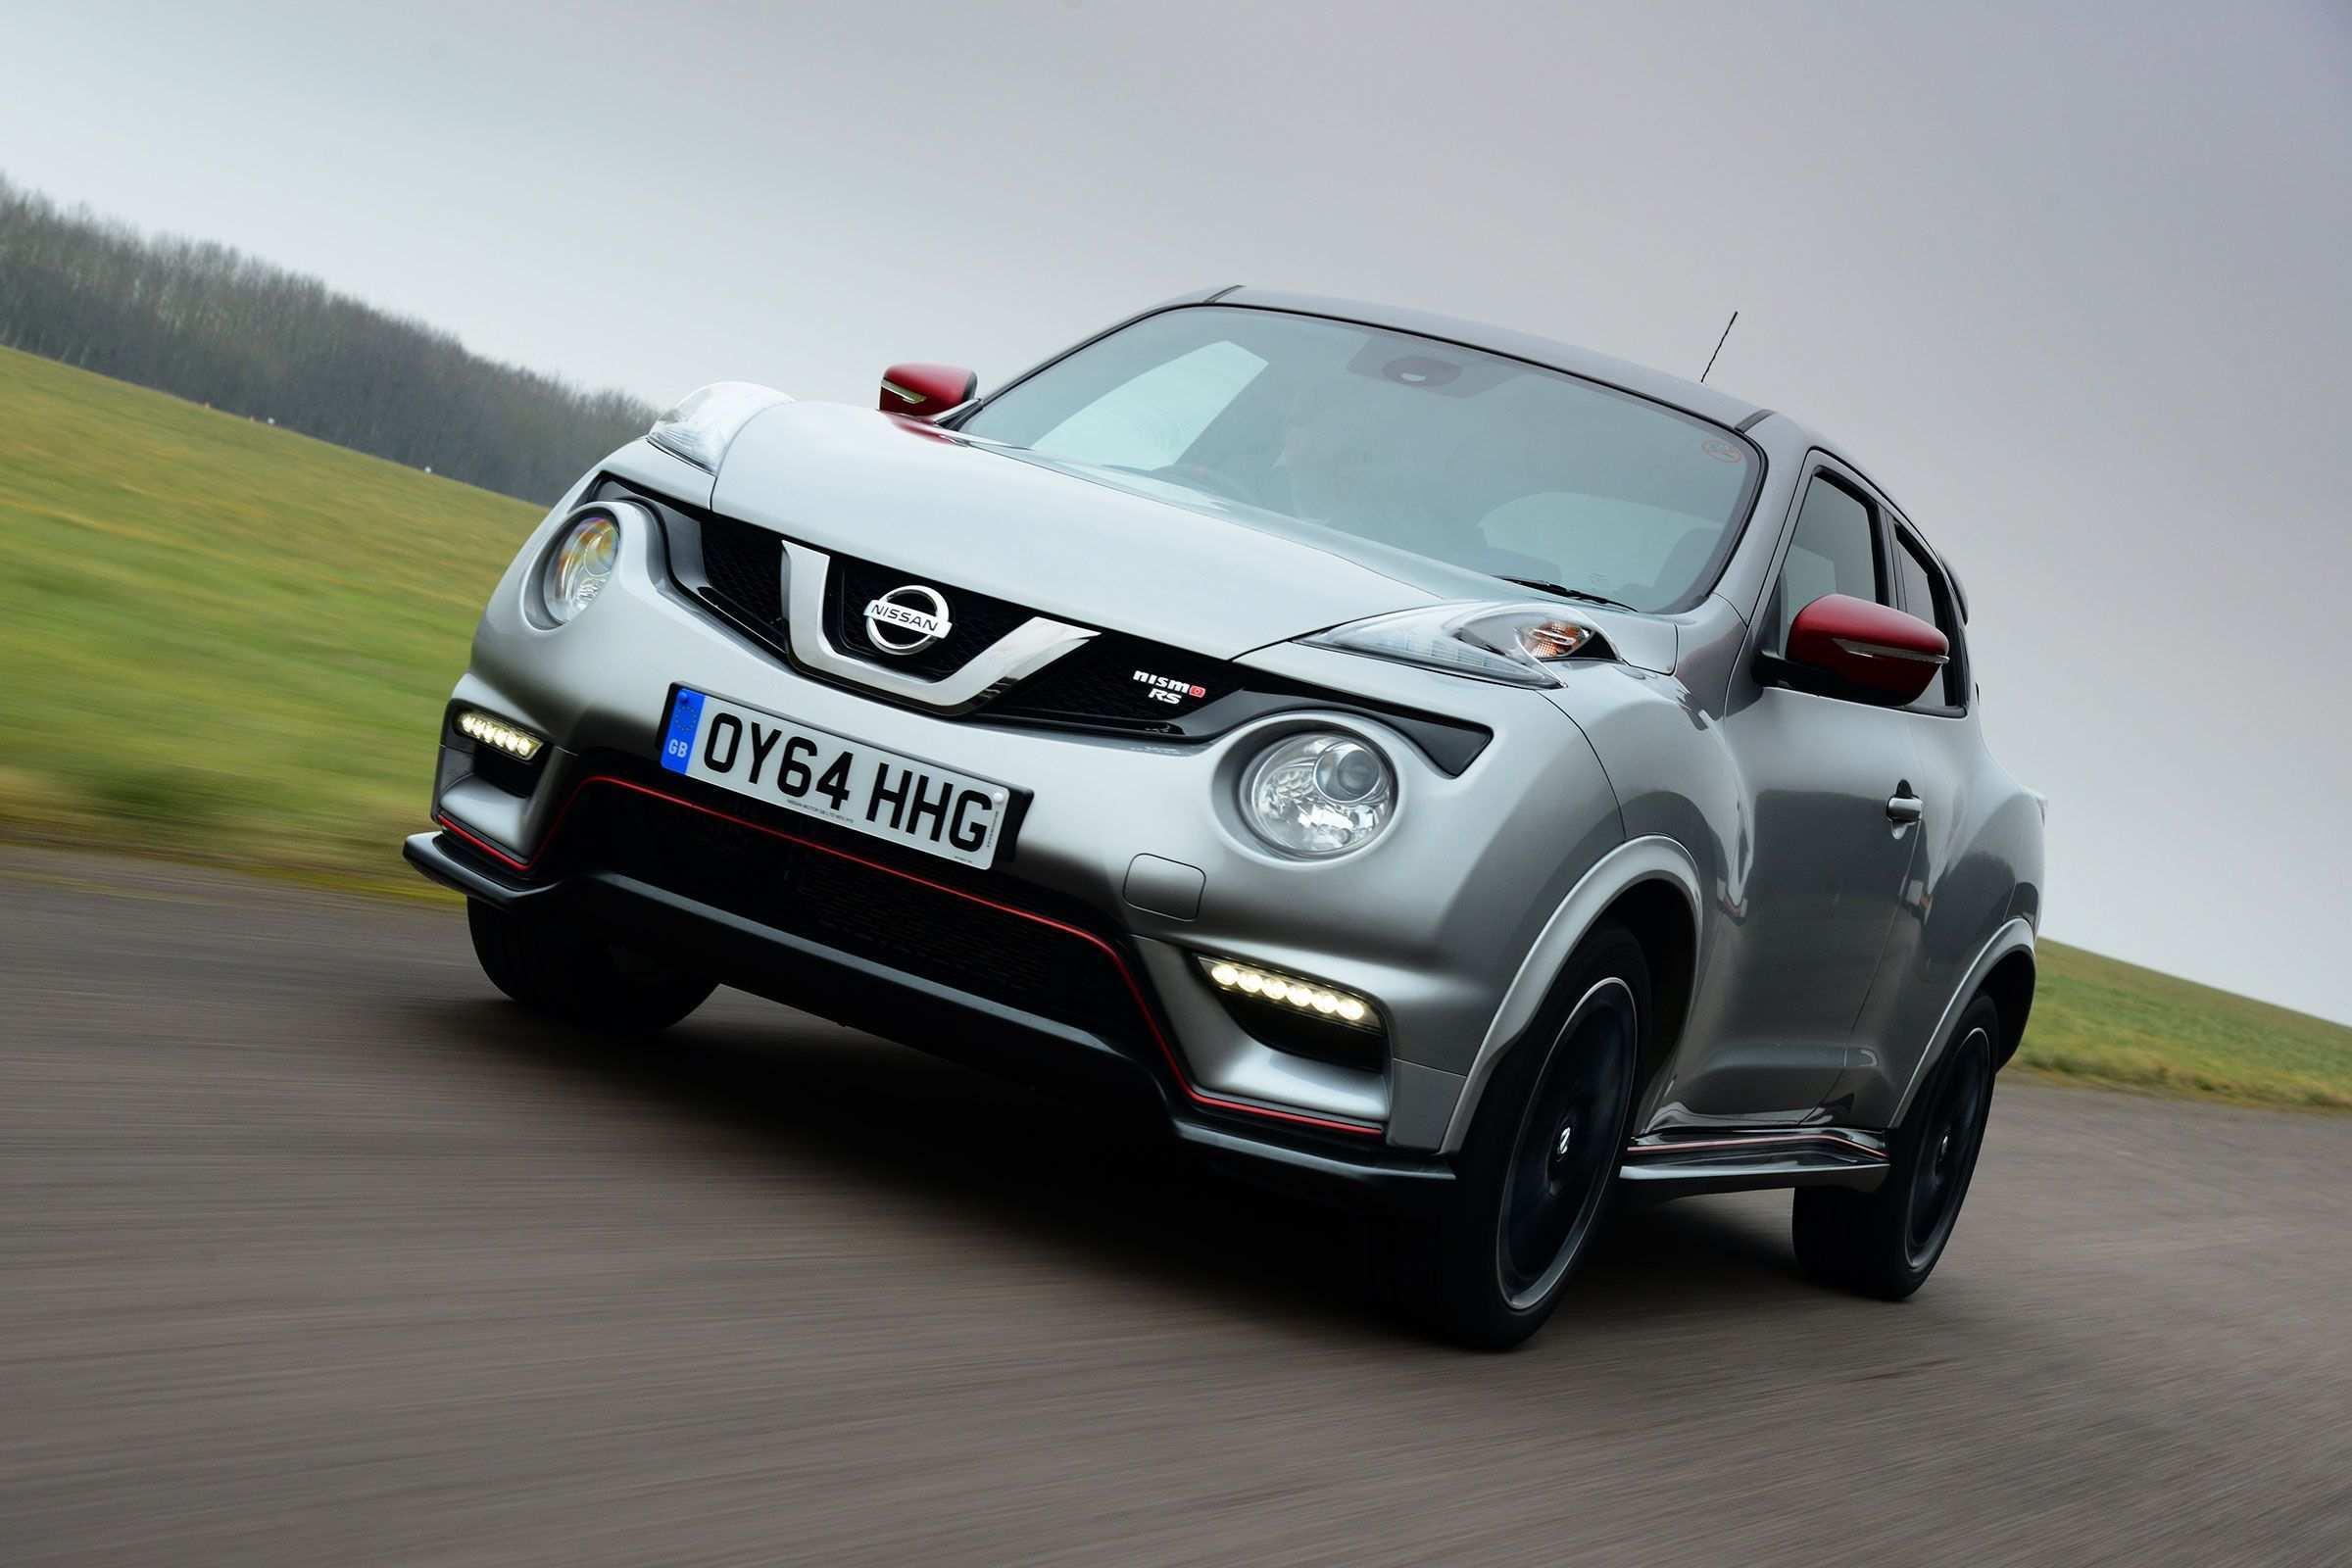 62 Gallery of Best 2019 Nissan Juke Nismo Spy Shoot First Drive for Best 2019 Nissan Juke Nismo Spy Shoot